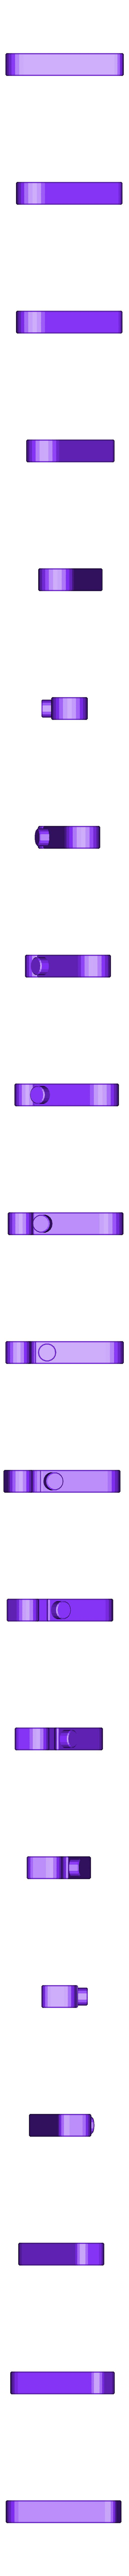 Key_Belt_holder4.STL Download STL file Bismuth GEM from Steven Universe, Wearable Plastic Crystal Gemstone Rainbow Color Prop, Bismouths Gems Costume, Cosplay, Comiccon, or Halloween • 3D printable design, mechengineermike